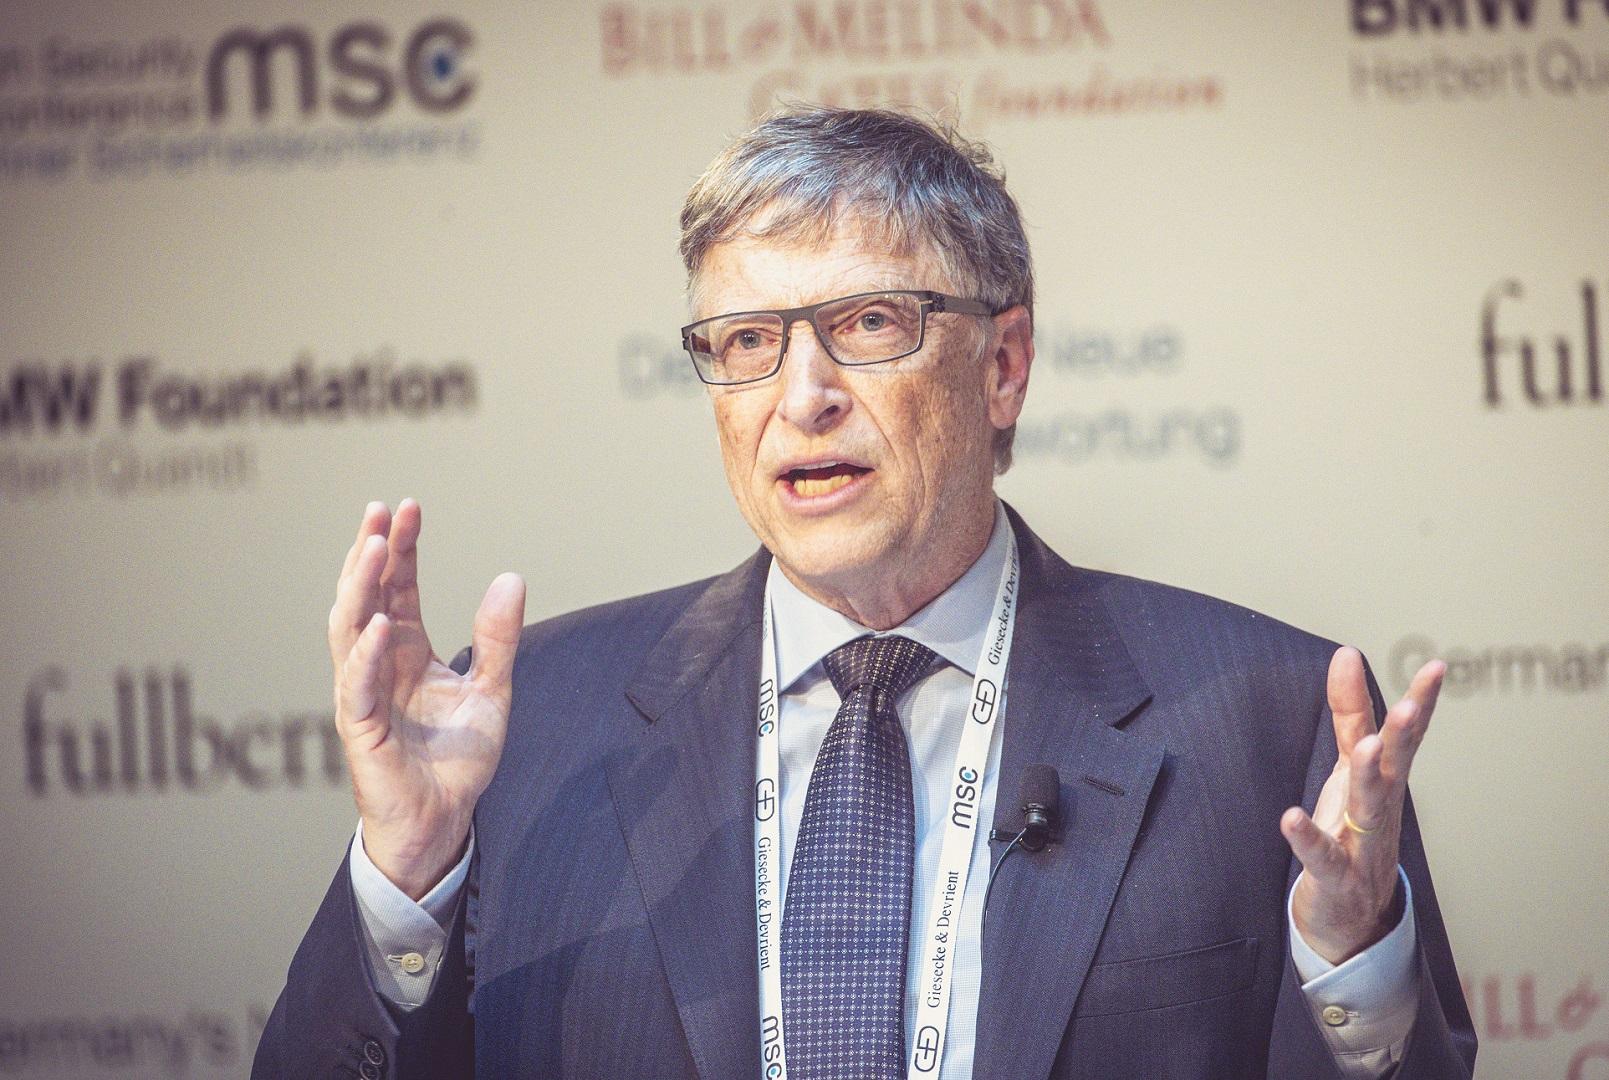 Bill_Gates_MSC_2017_2